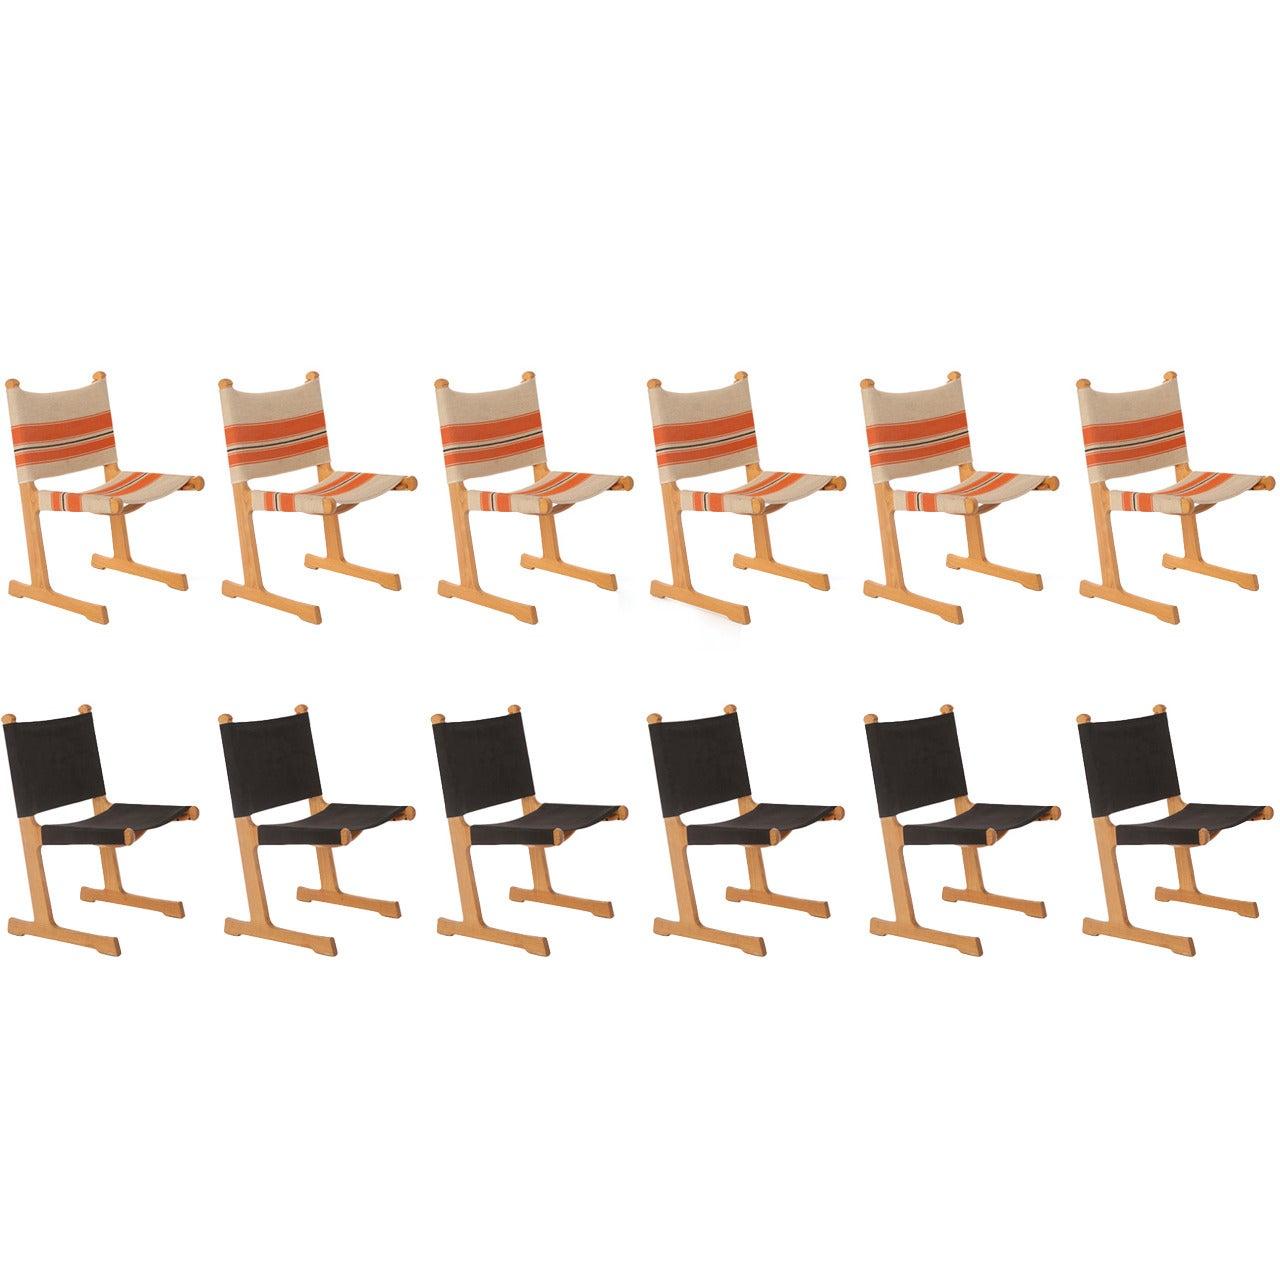 12 Oak Sling Dining Chairs by Adrian Heath for Cado